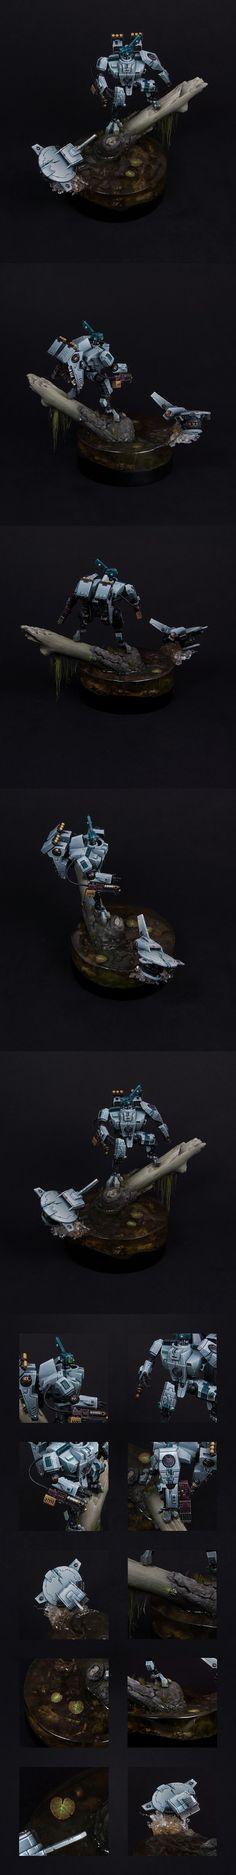 40k - Tau XV8-11b Polypheme Crisis Battlesuit by itshammertime!